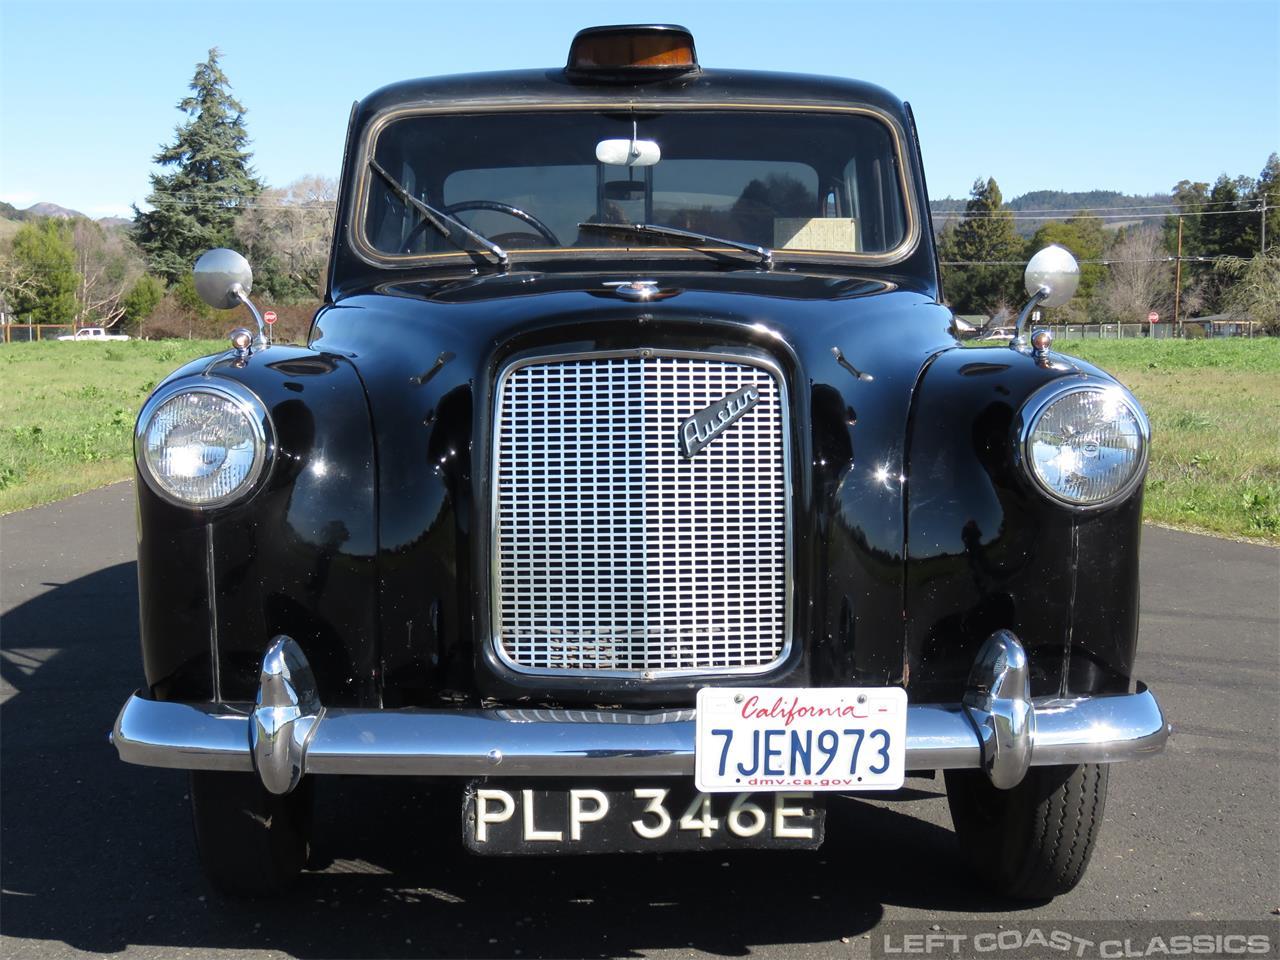 Large Picture of 1967 Austin FX4 Taxi Cab located in SONOMA California - PKBX